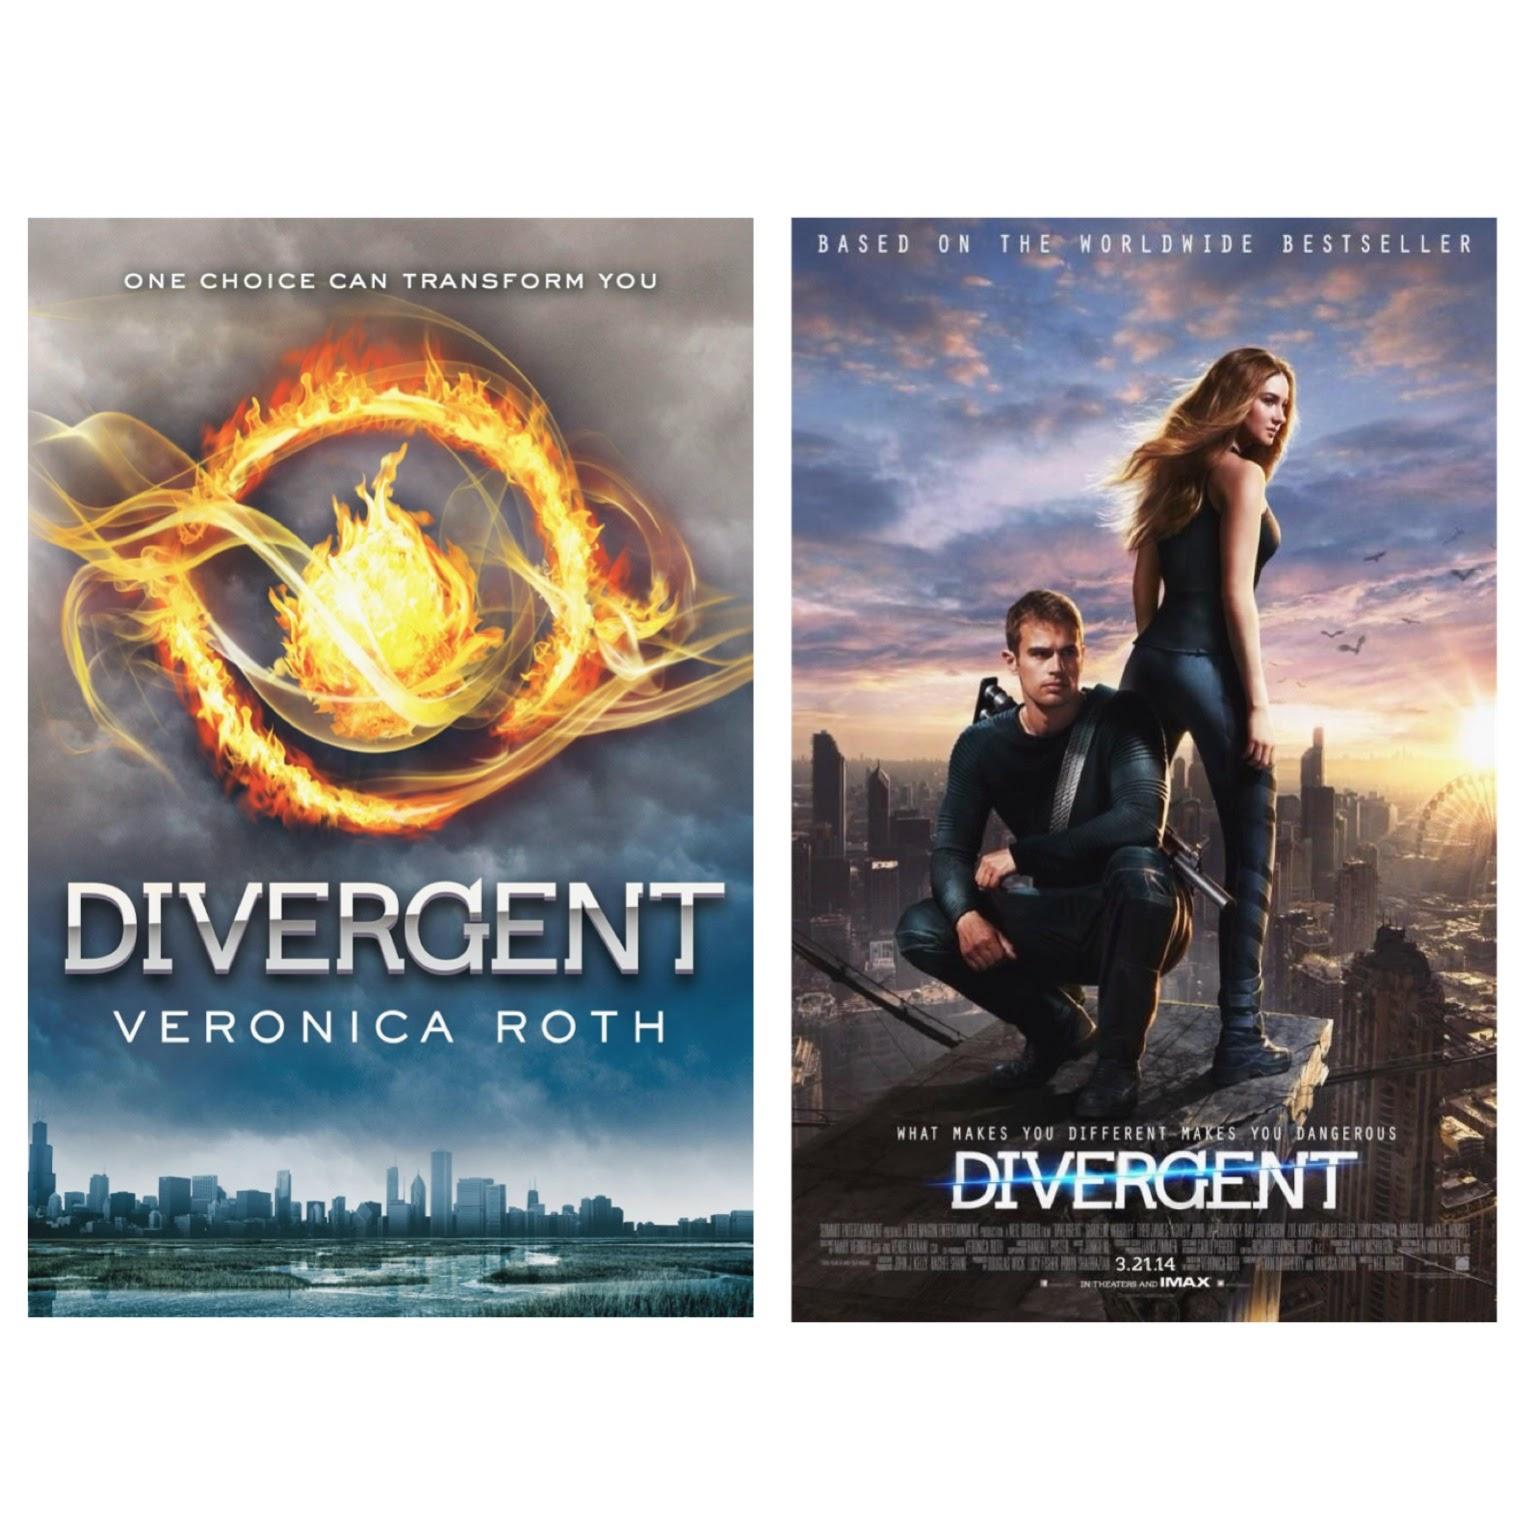 divergent book movie comparison review reads by amanda